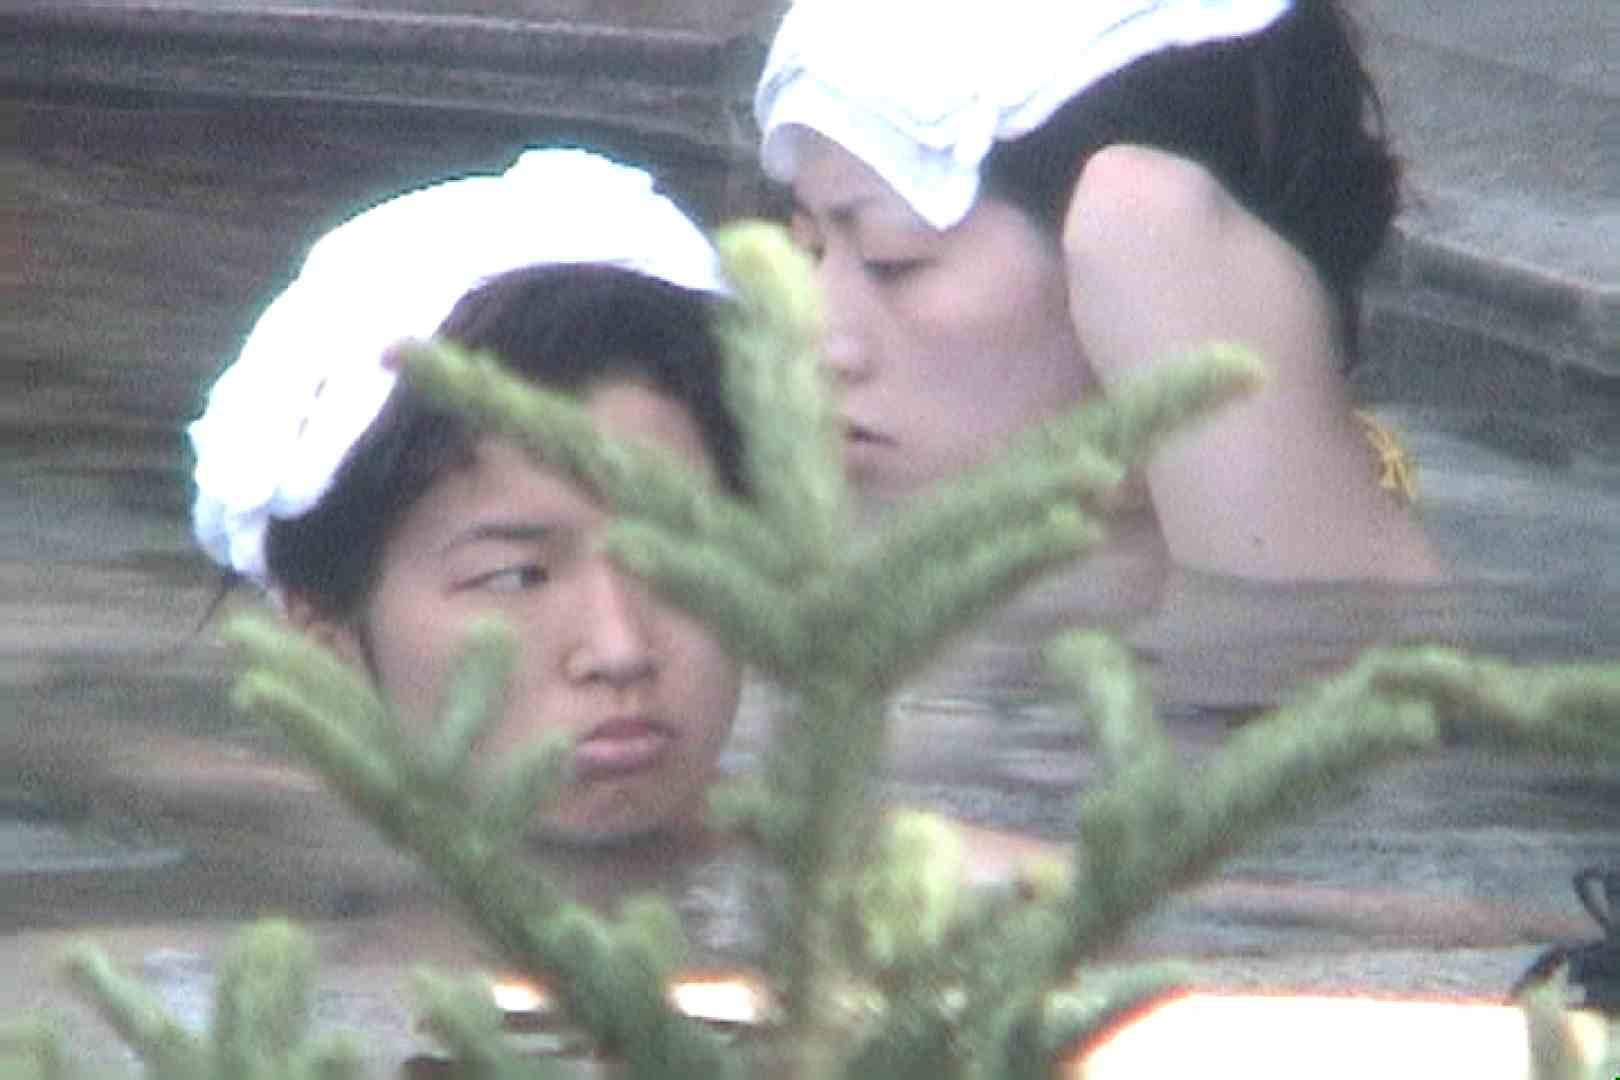 Aquaな露天風呂Vol.80【VIP限定】 露天風呂編   盗撮シリーズ  76PIX 17